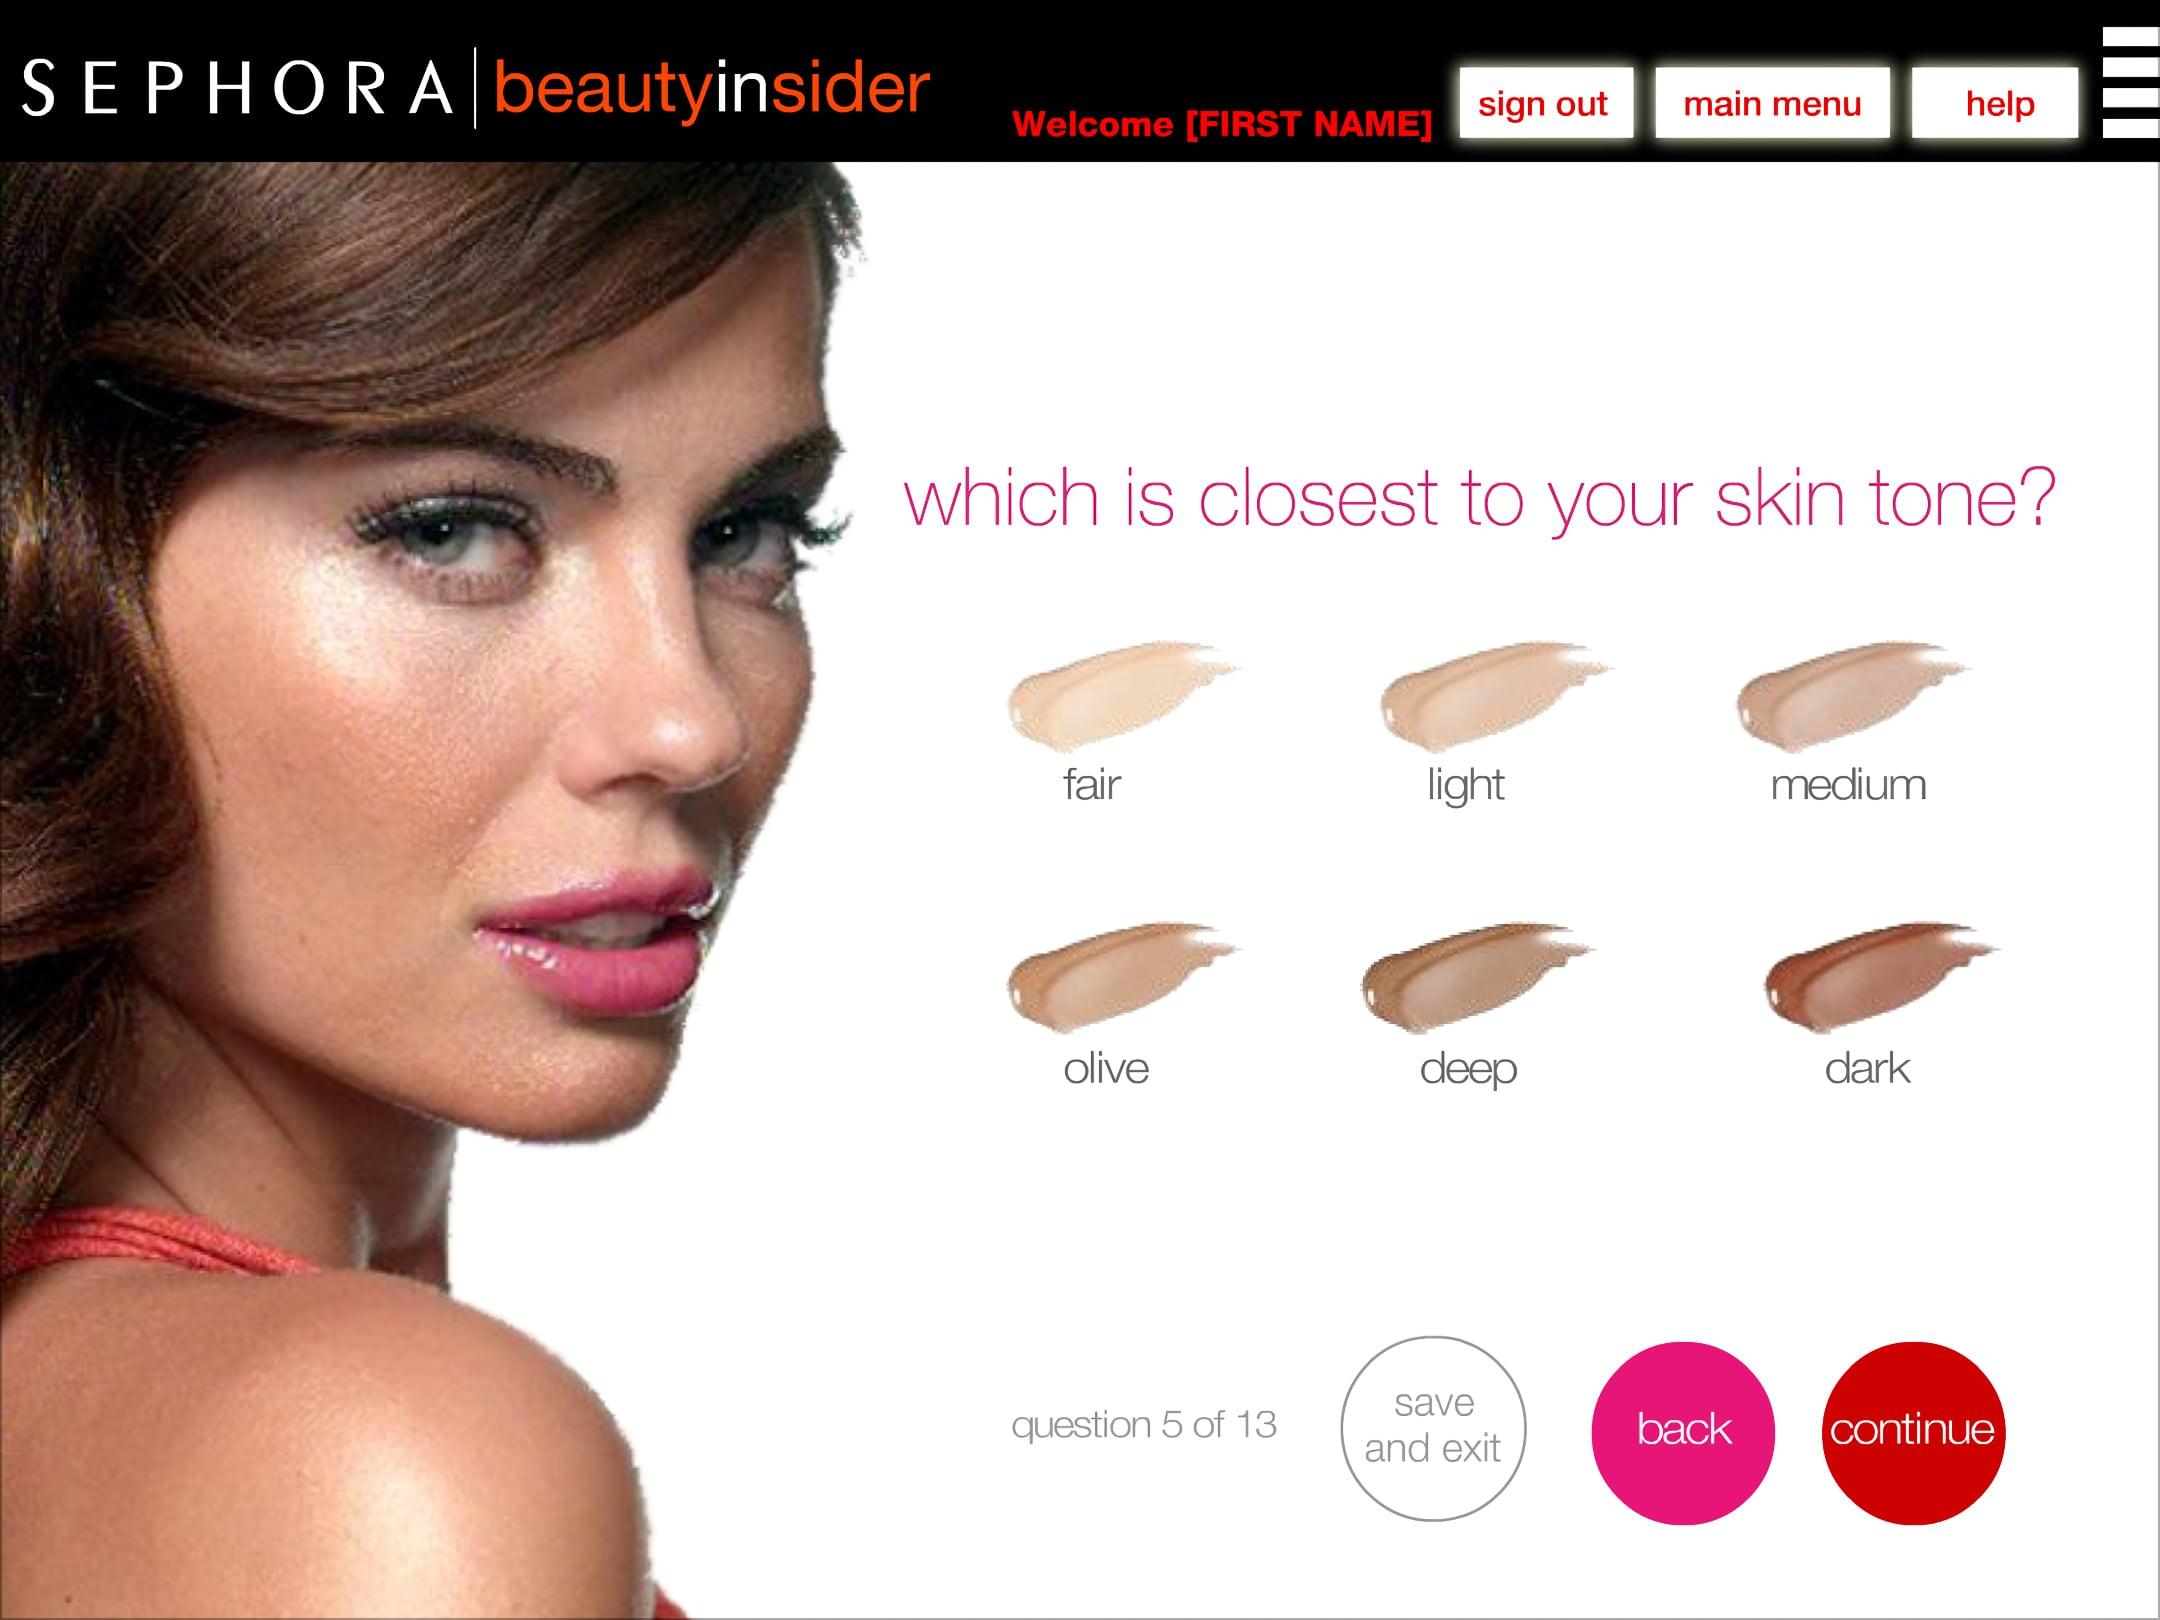 Sephora BI skin tone chooser